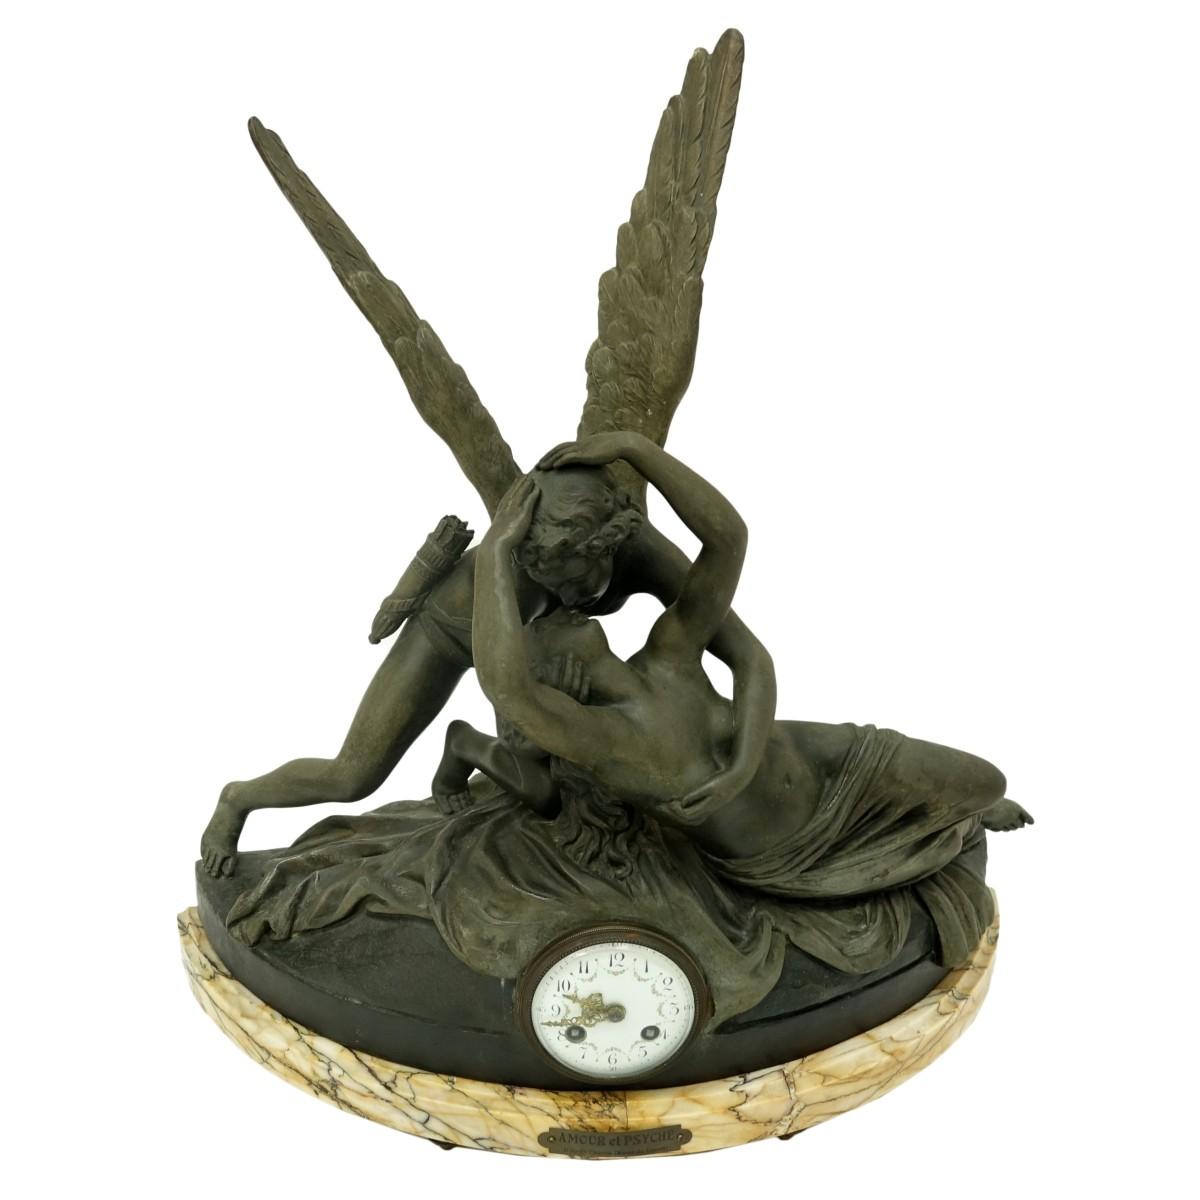 Lot 188 - After: Antonio Canova (1757 - 1822) Mantle Clock